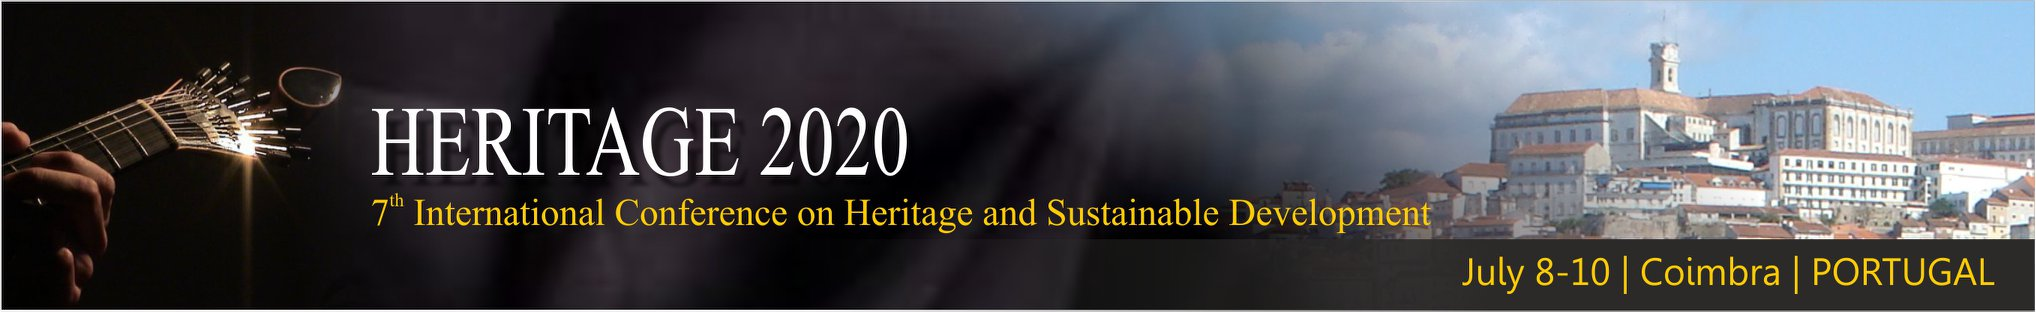 heritage 2020 portugal banner